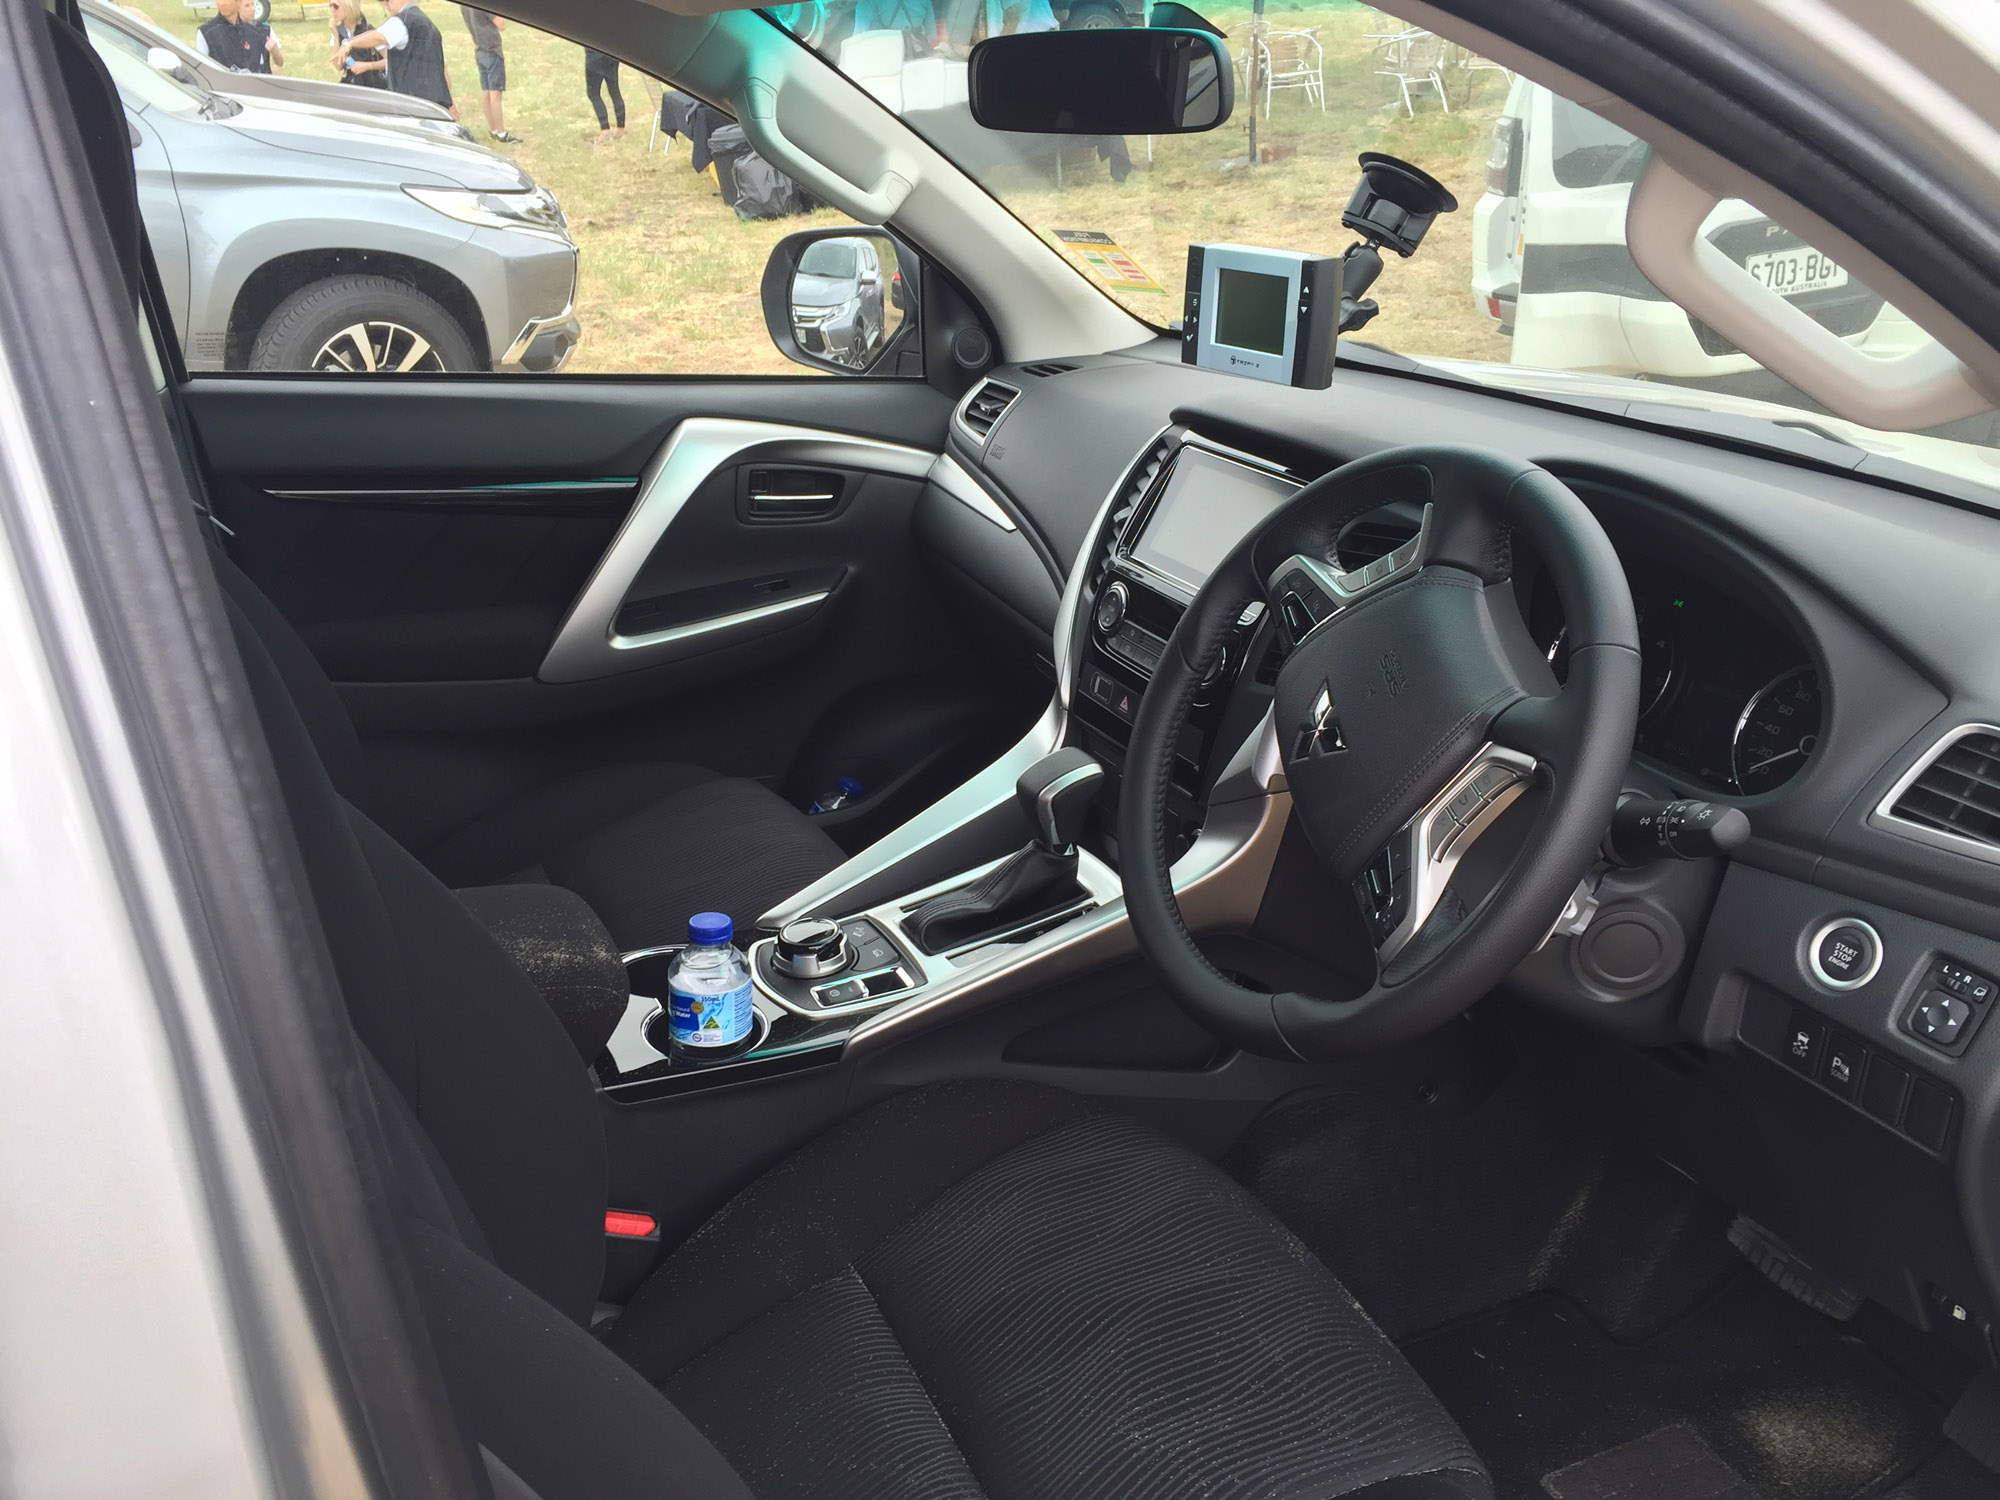 2016 Mitsubishi Sport Interior Pajero